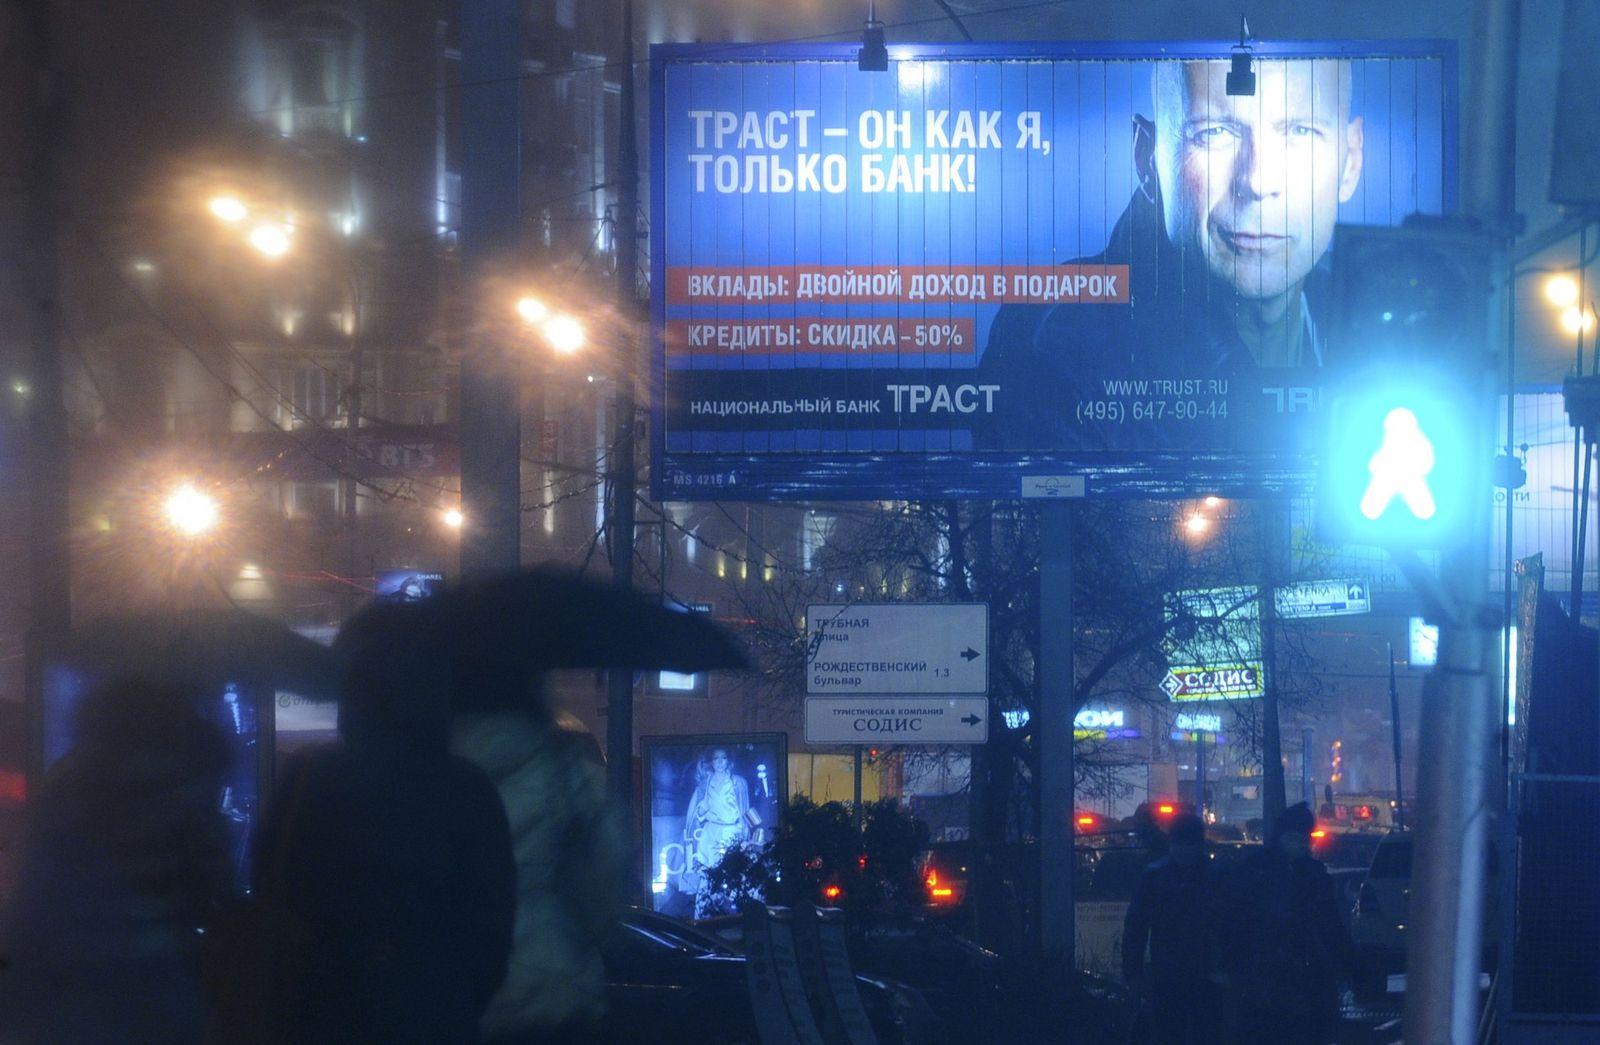 Russland/ Trust Bank/ Werbung/ Willis